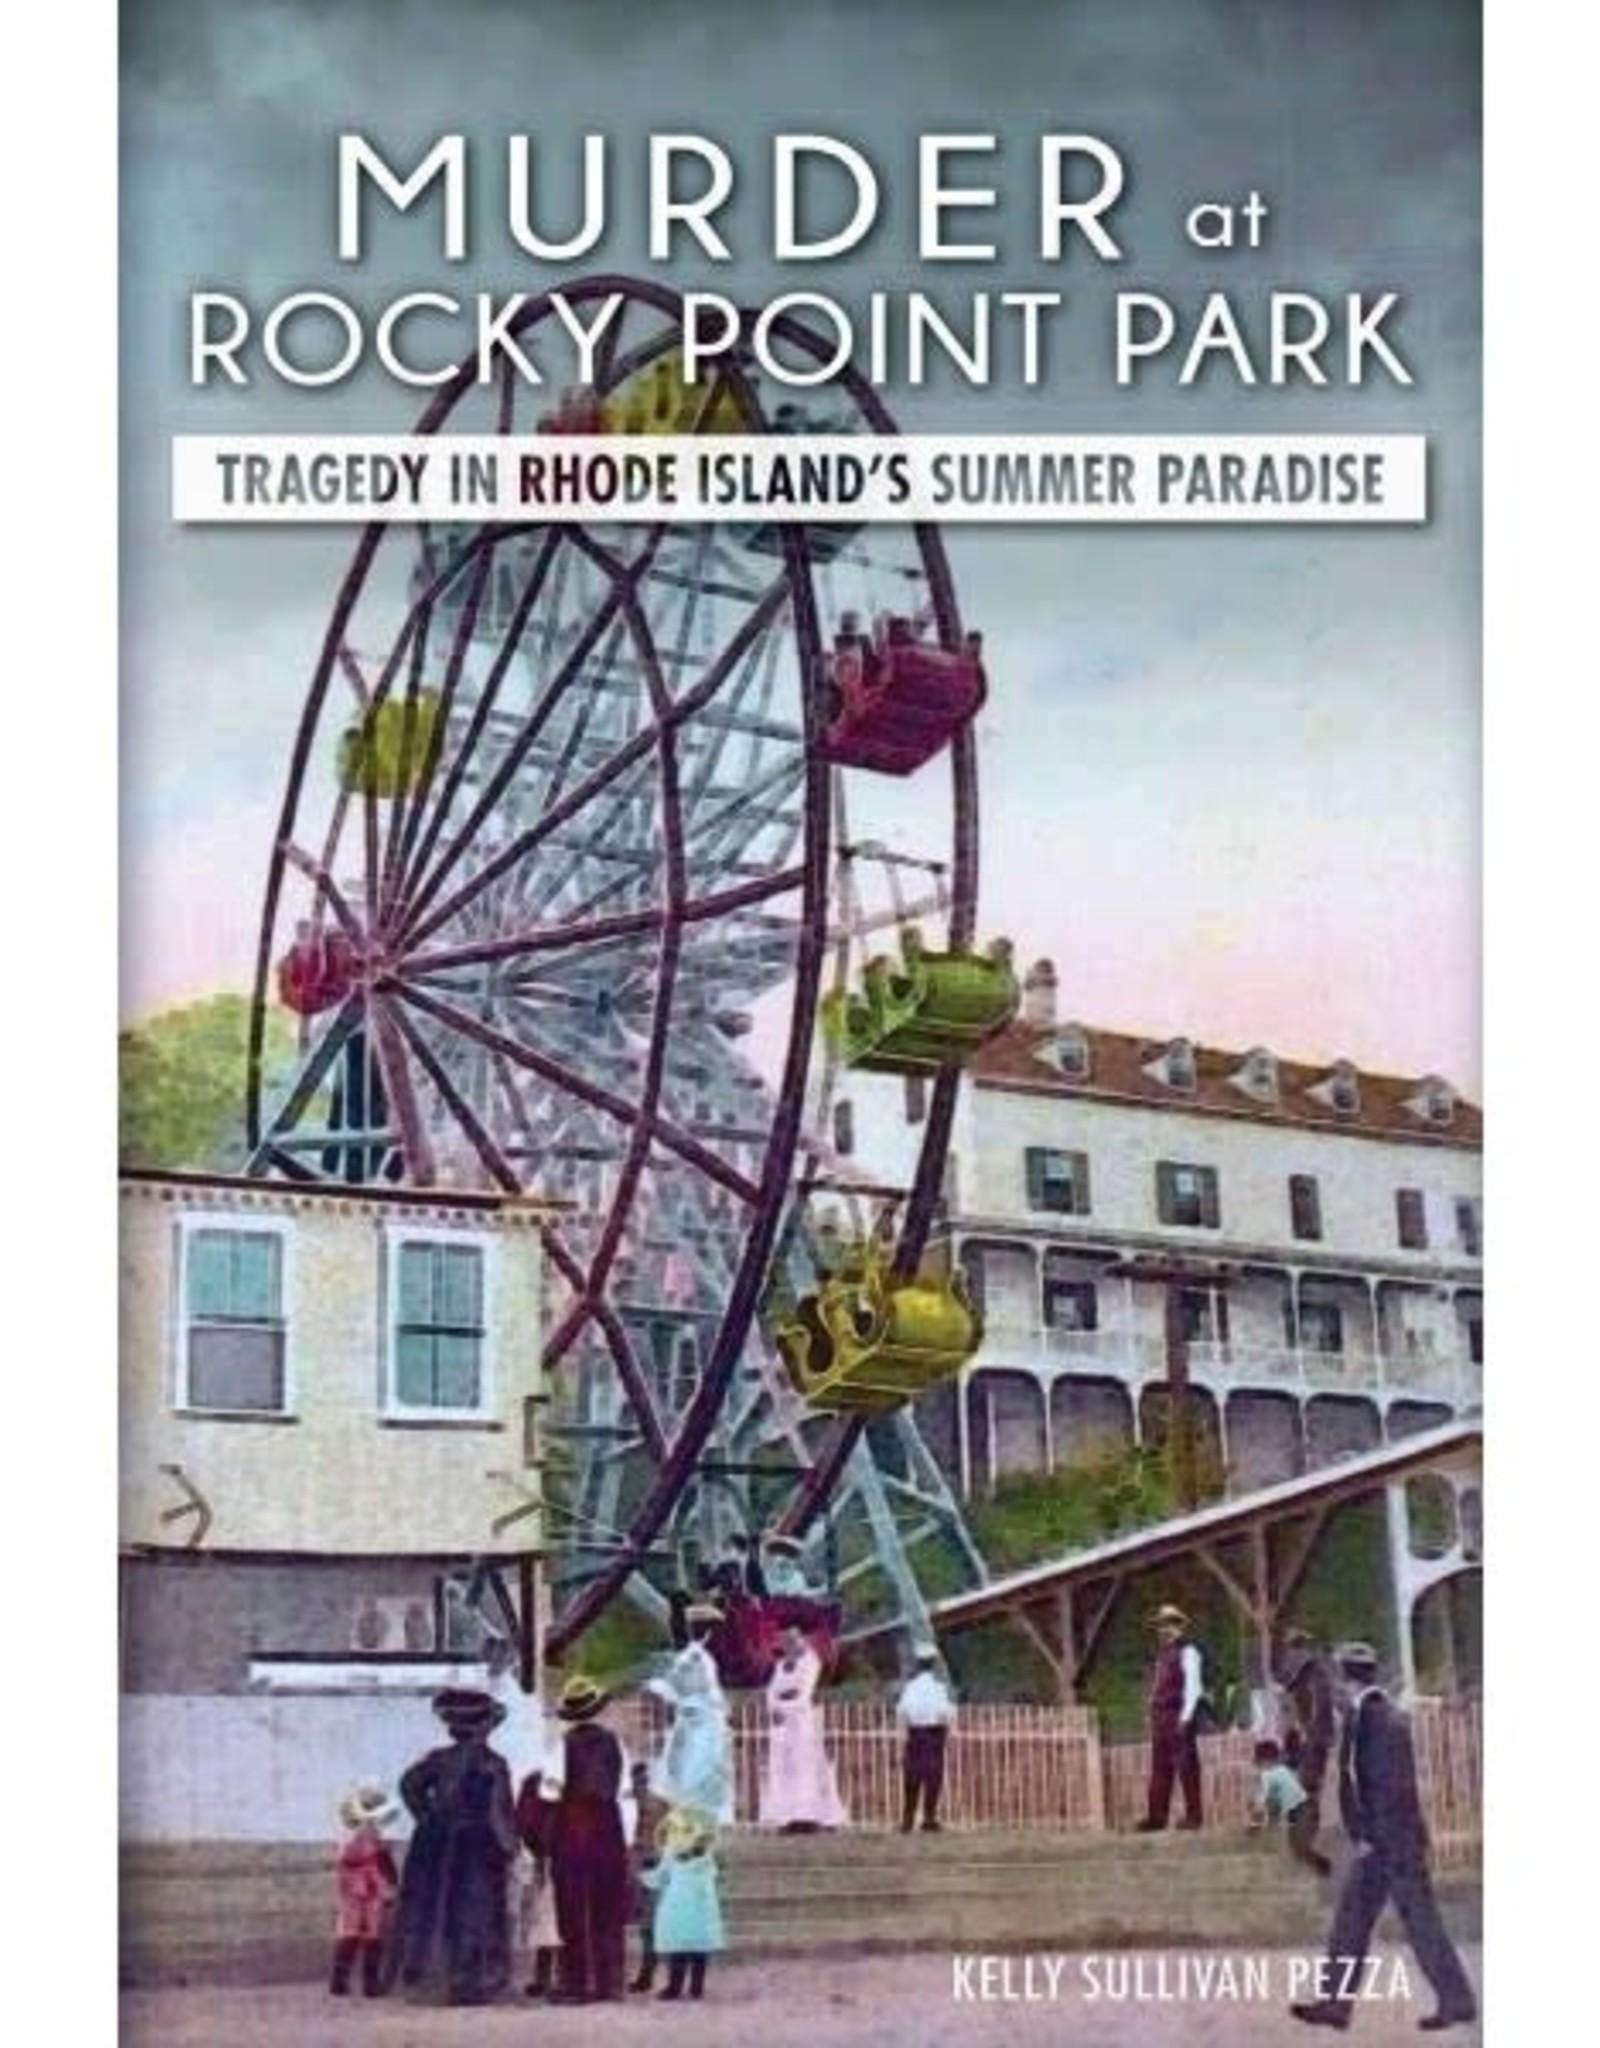 Murder at Rocky Point Park